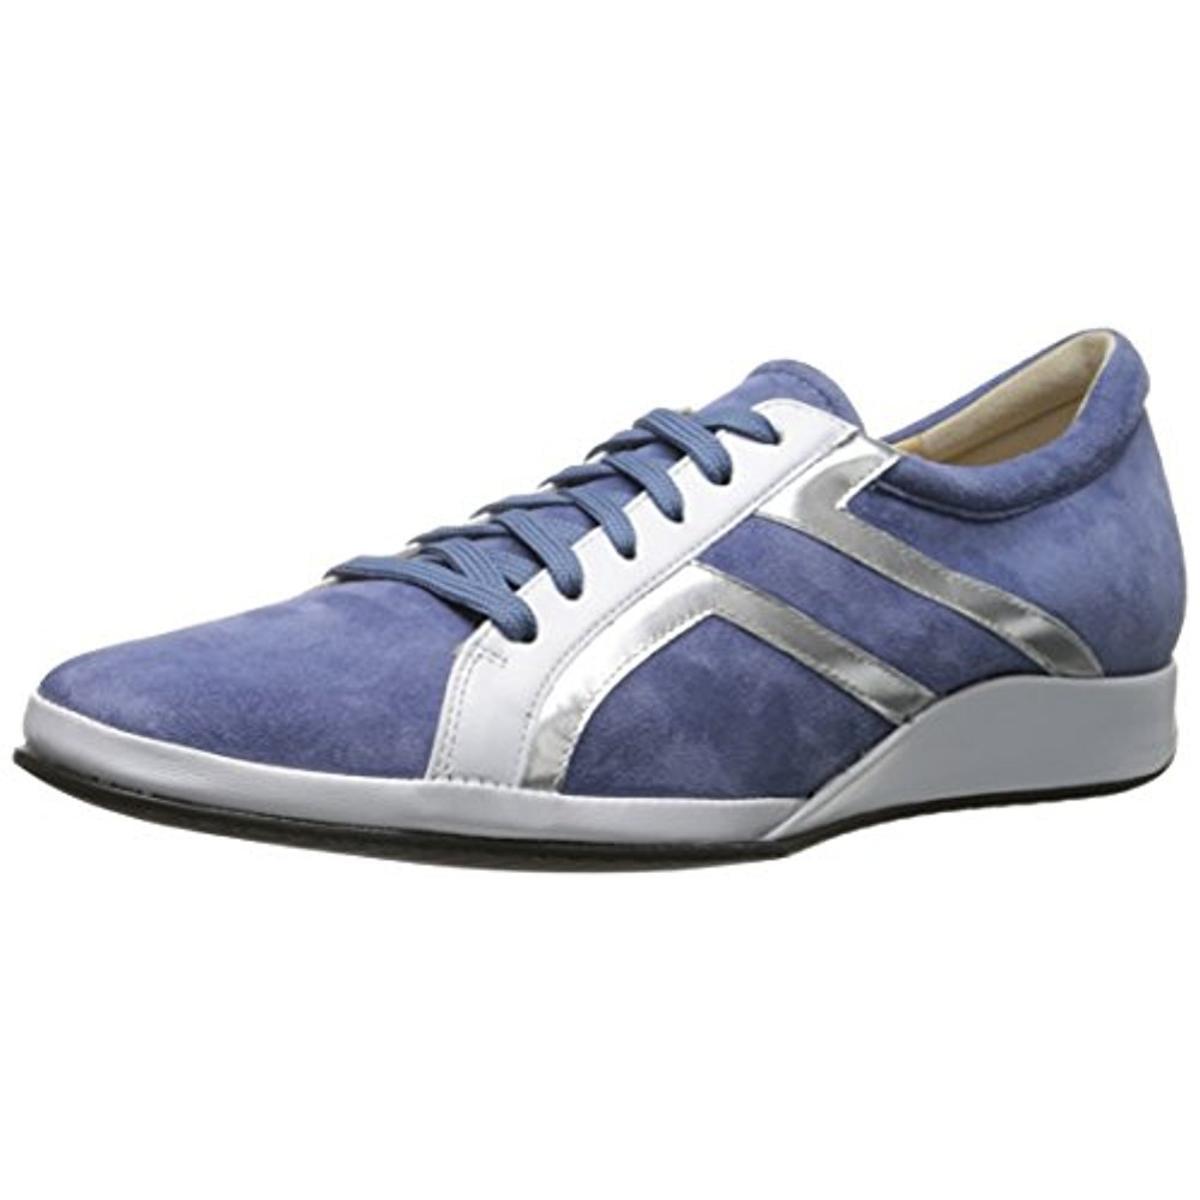 Amalfi by Rangoni Womens Ecco Suede Wedge Fashion Sneakers by Amalfi by Rangoni